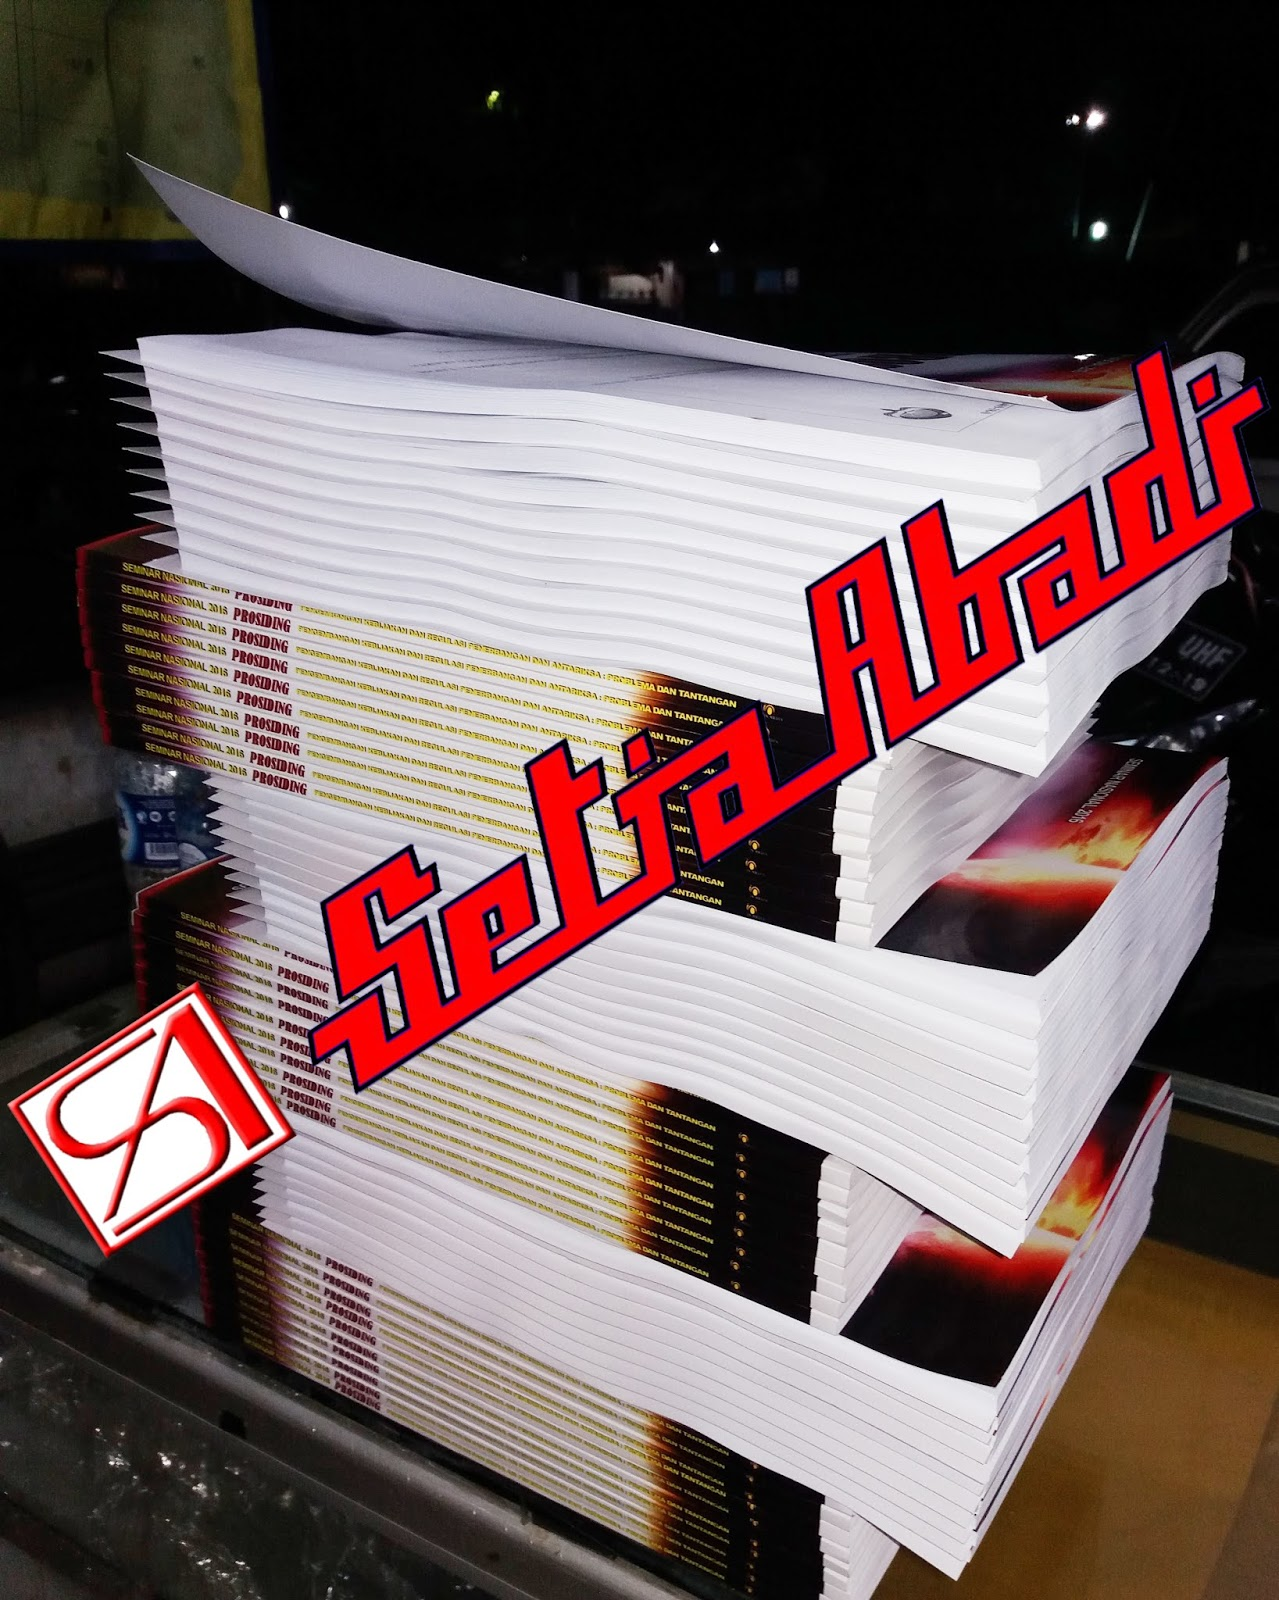 https://www.offsetprinting21.com/2019/01/jasa-jilid-soft-cover-di-jakarta_7.html